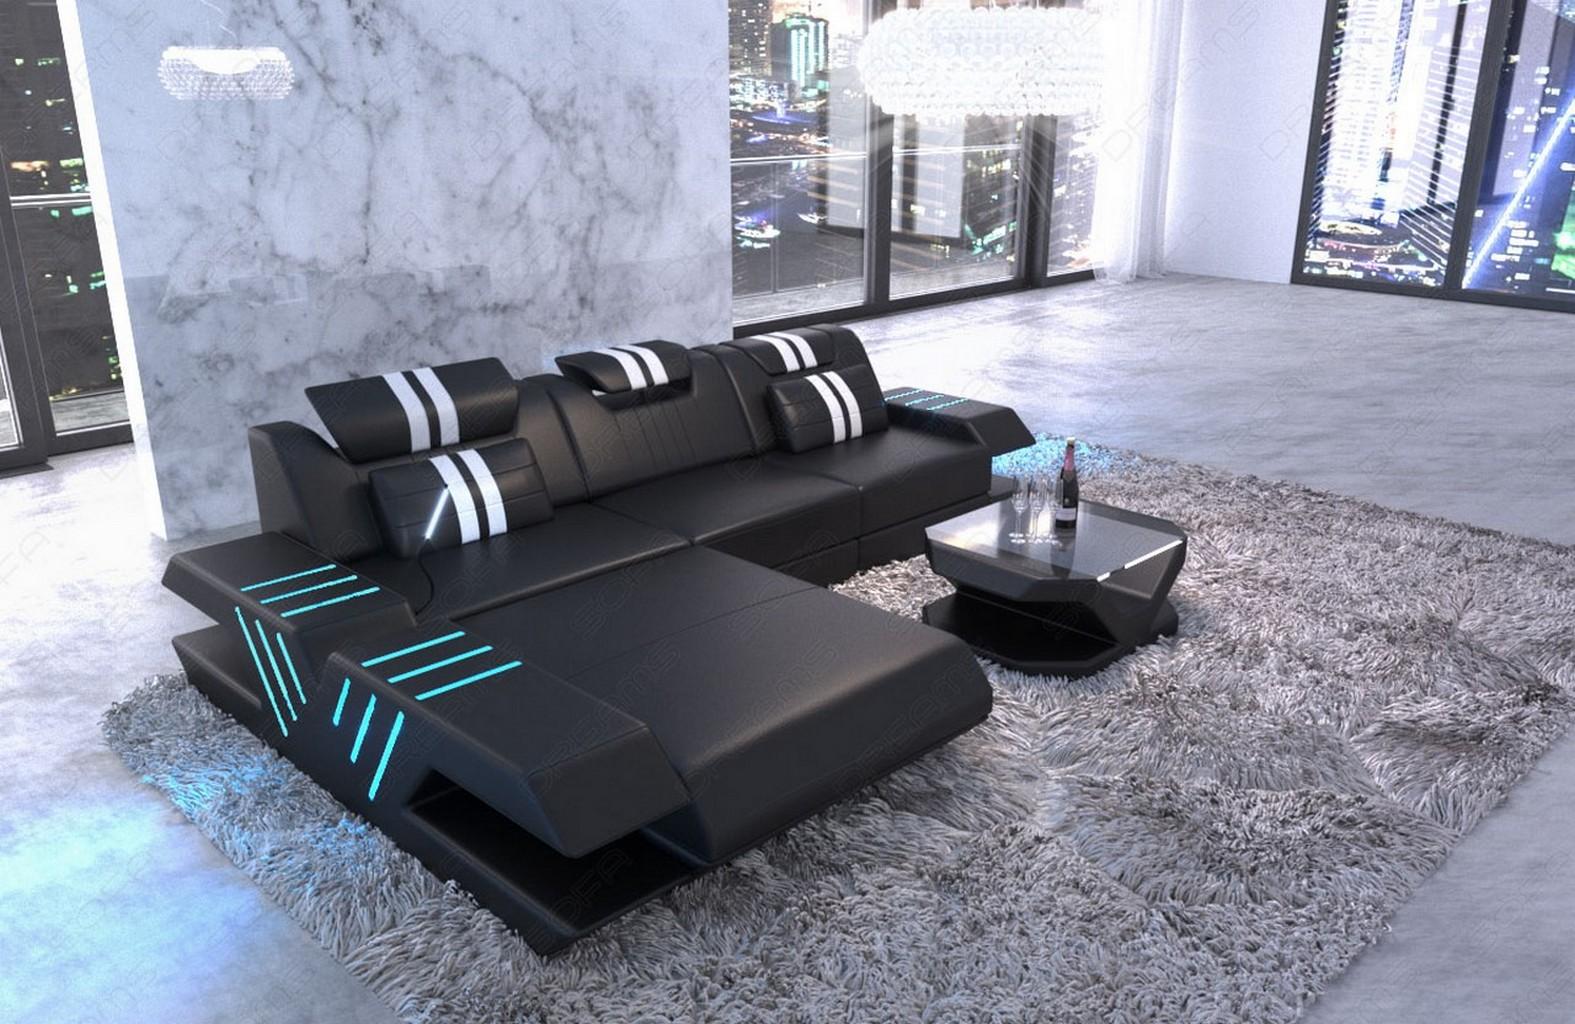 echtleder couch venedig l form ecksofa ottomane sofa led usb schwarz weiss ebay